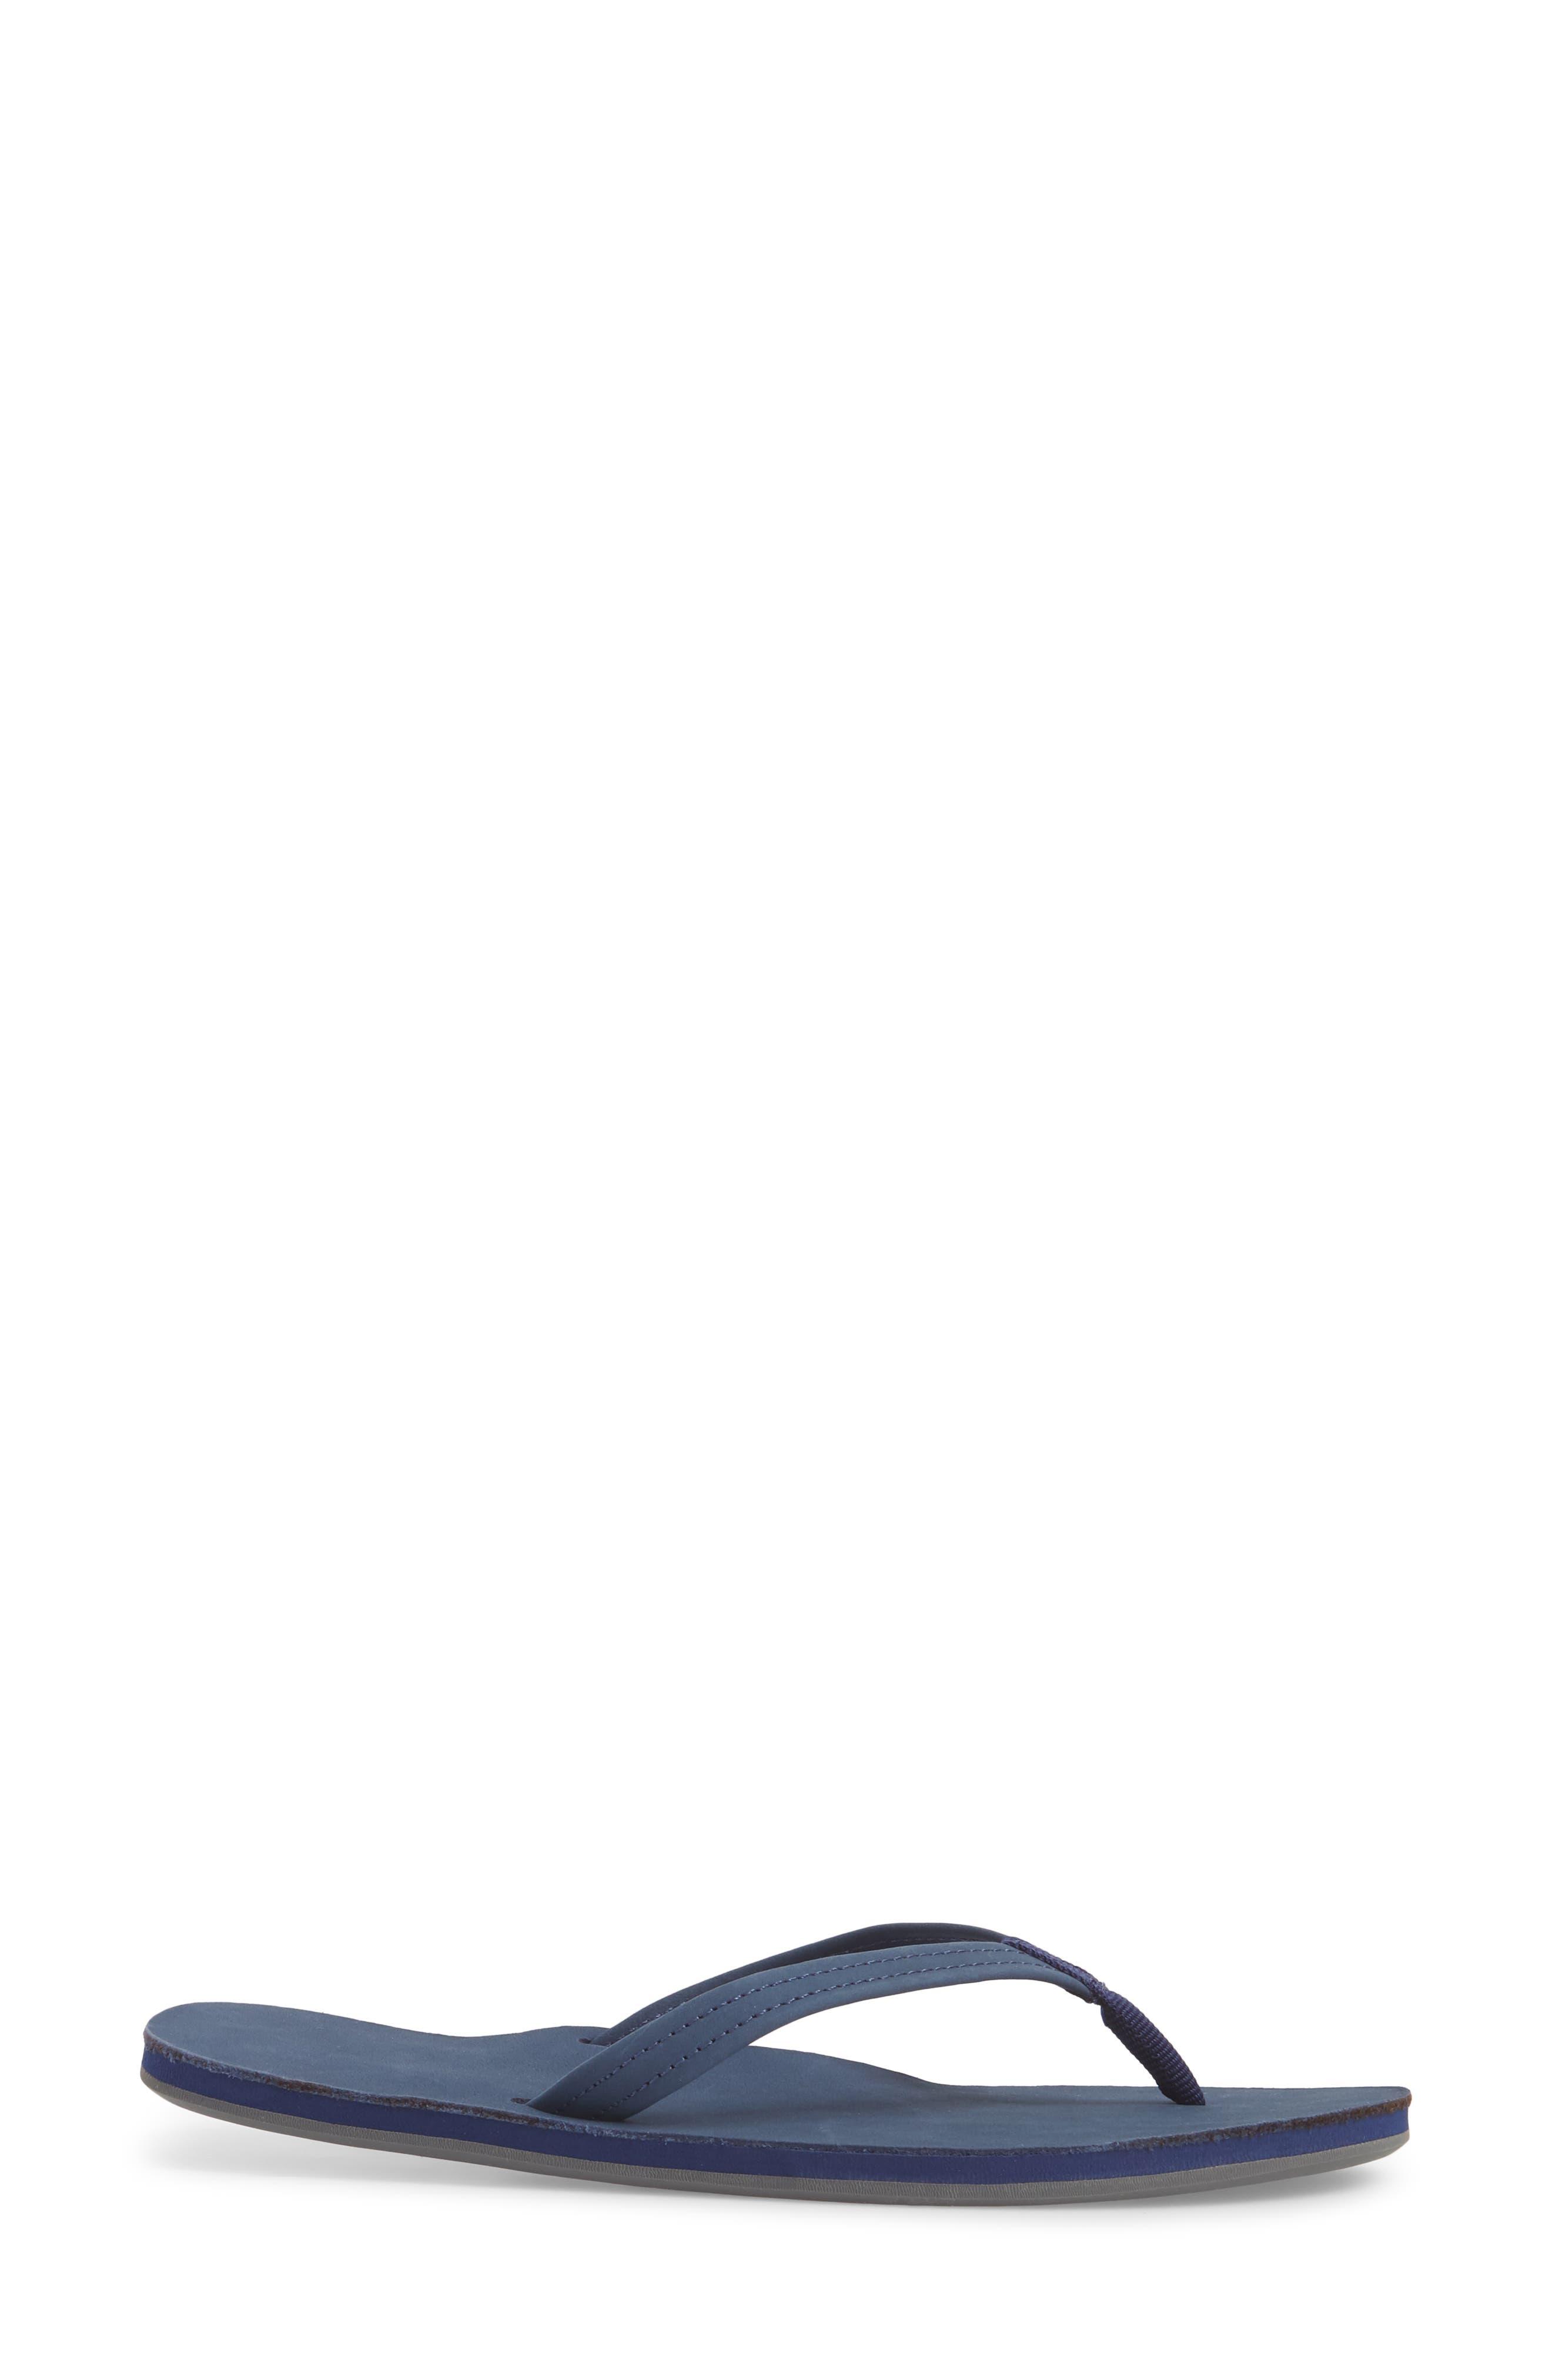 Fields Flip Flop,                             Alternate thumbnail 3, color,                             Navy Peach Gray